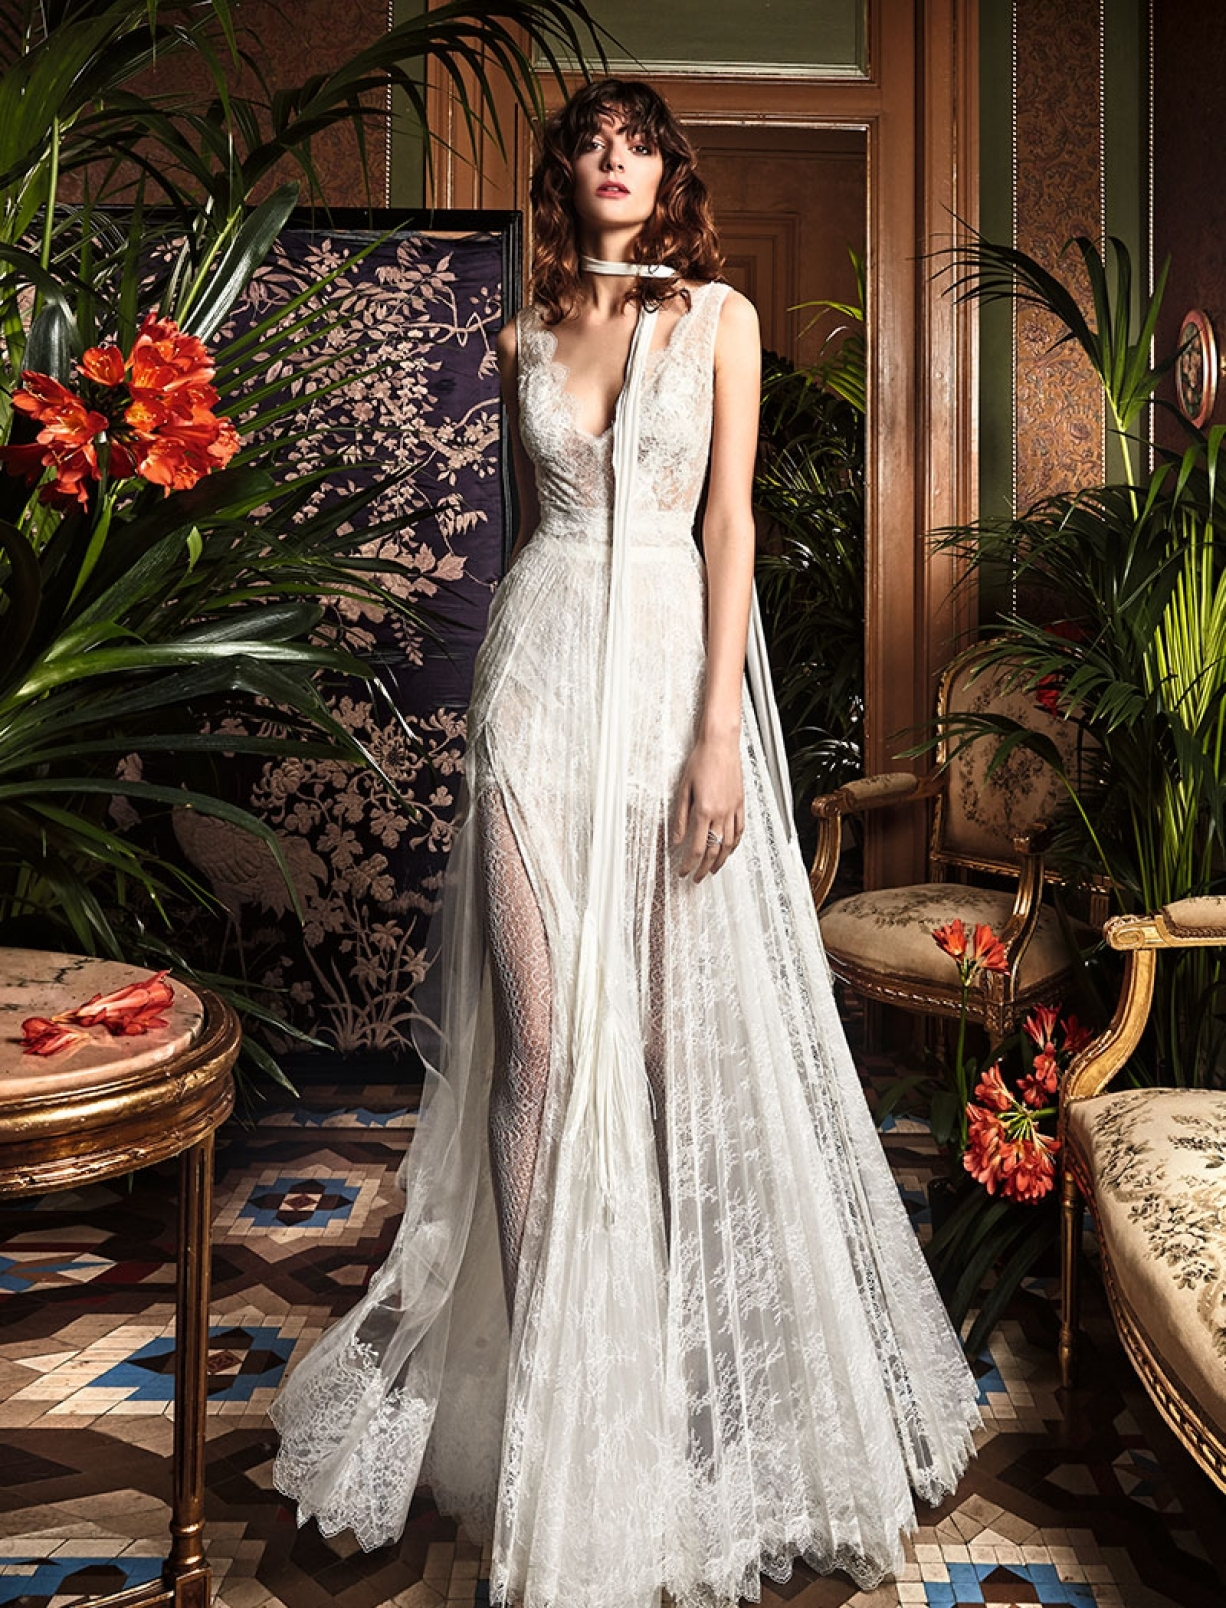 boho_chic_wedding_dresses_2017_bohemian_lace_wedding_dress_yolan_cris_chris_style_boldo.jpg